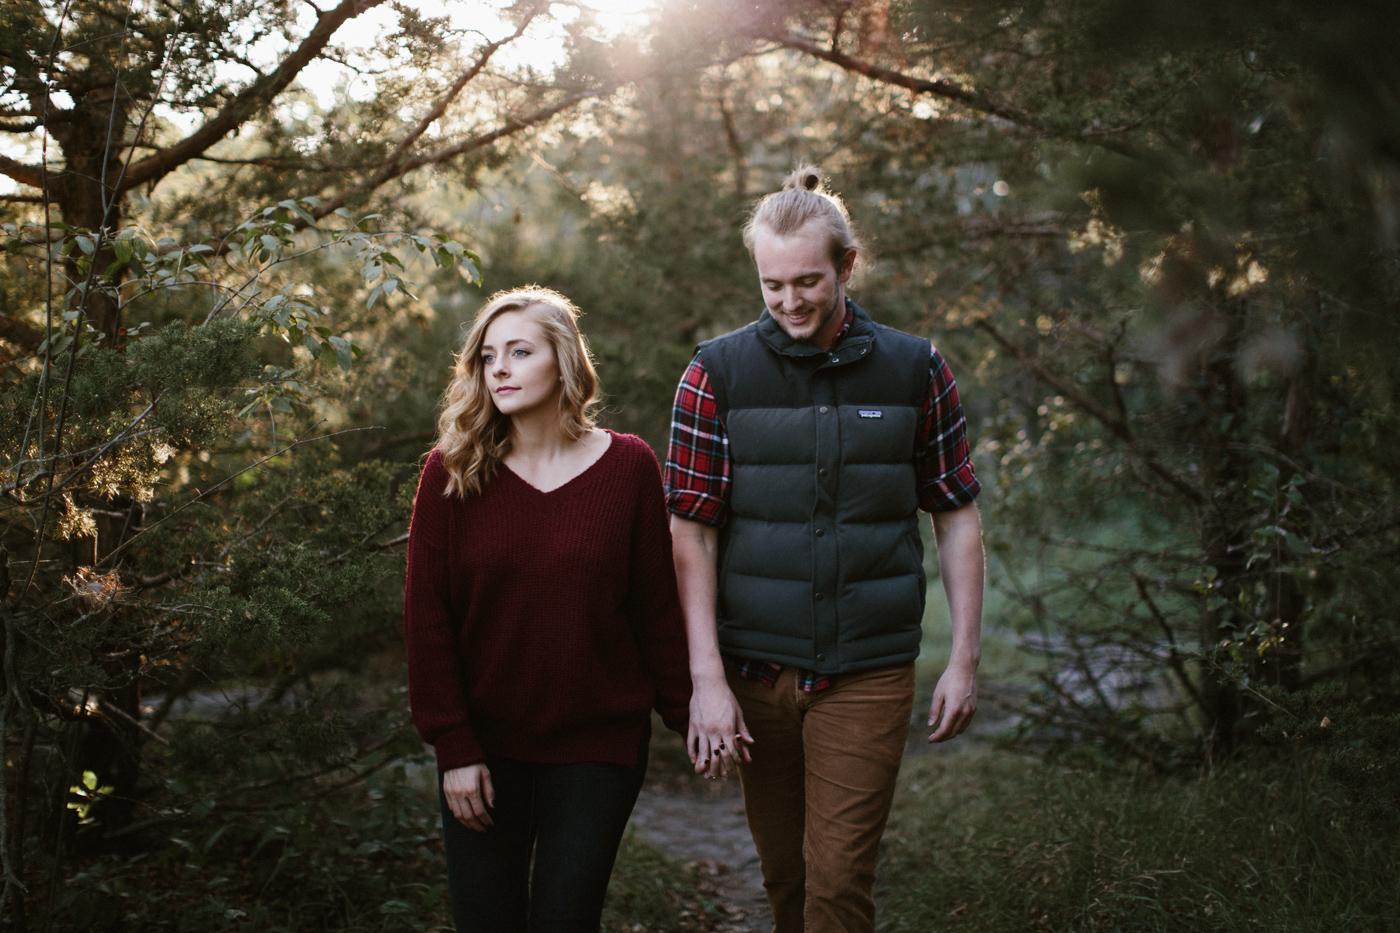 Sioux_Falls_Des_Moines_Engagement_Wedding_Photographer_22.jpg